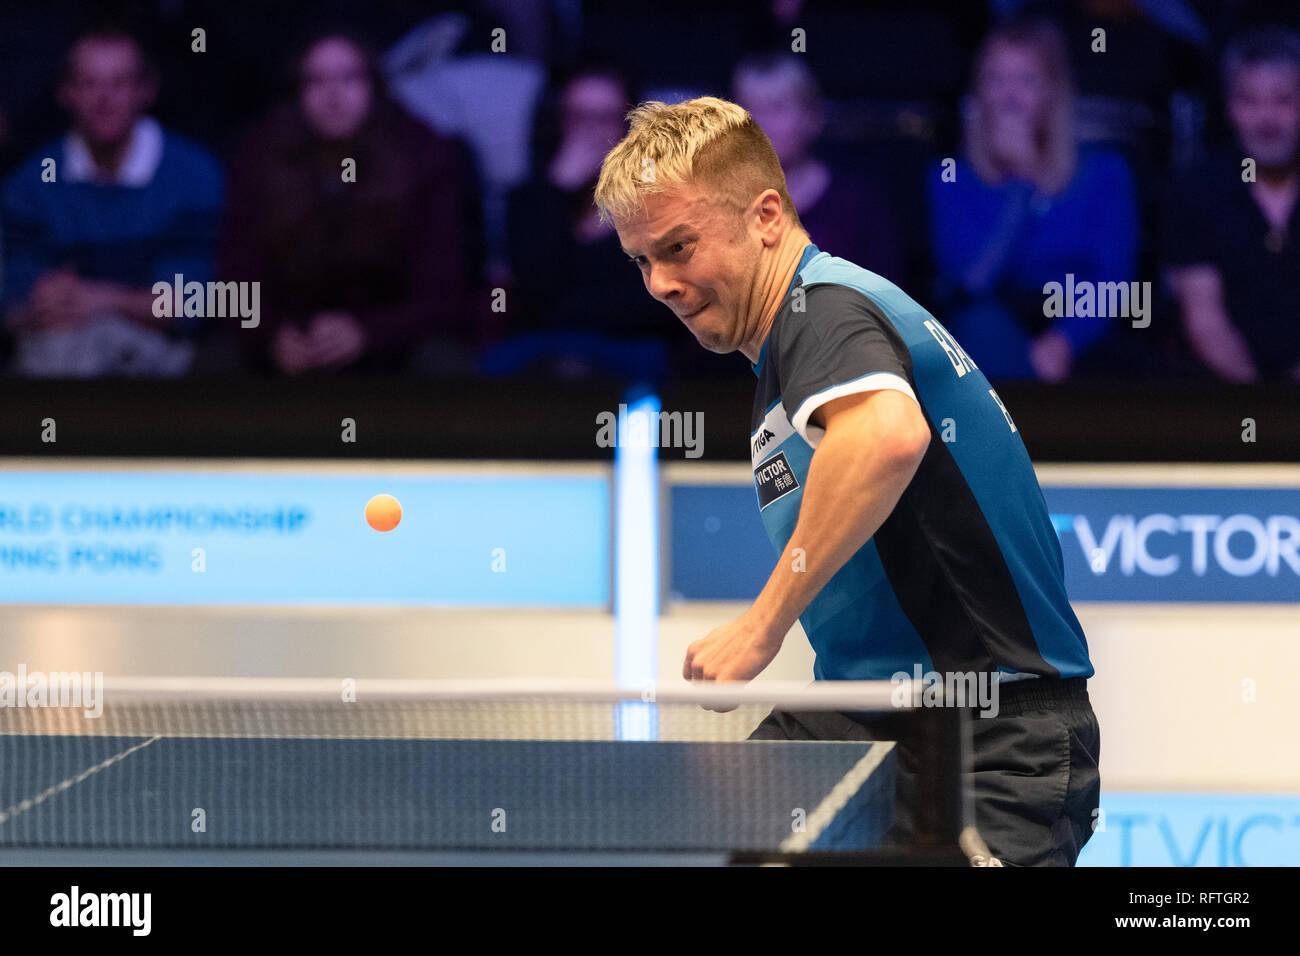 World championship of ping pong betting on sports ross county v kilmarnock betting expert sports